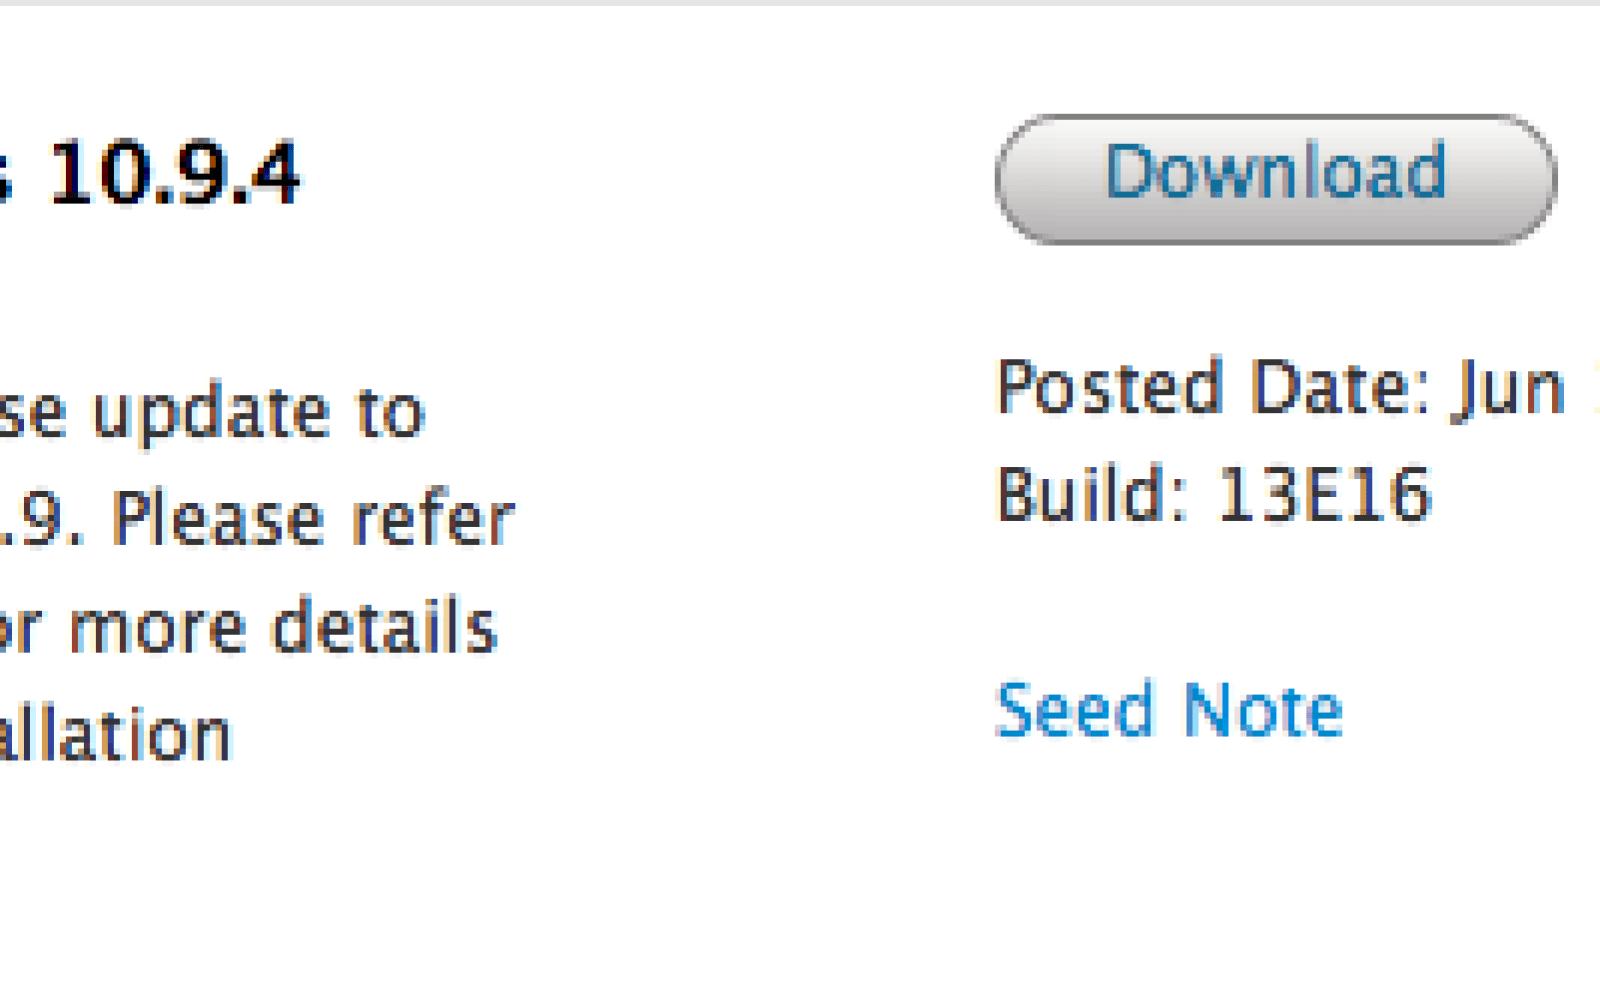 Apple seeds new OS X 10.9.4, OS X Server, and Safari betas to developers